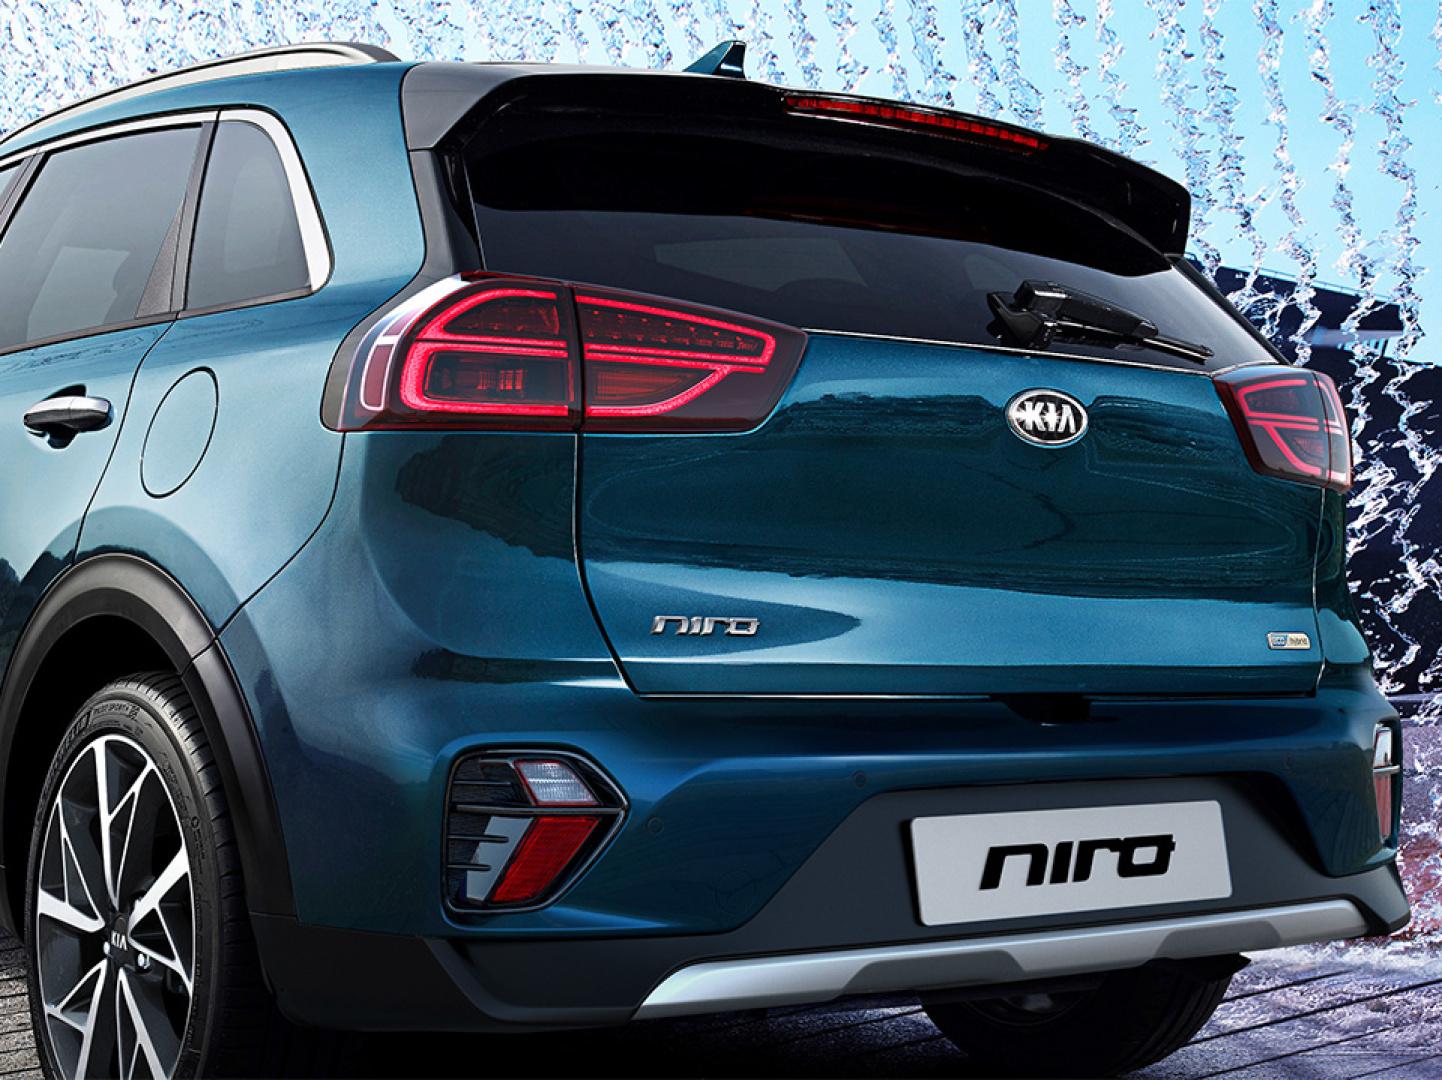 Kia-Hybride-Niro Hybrid-0